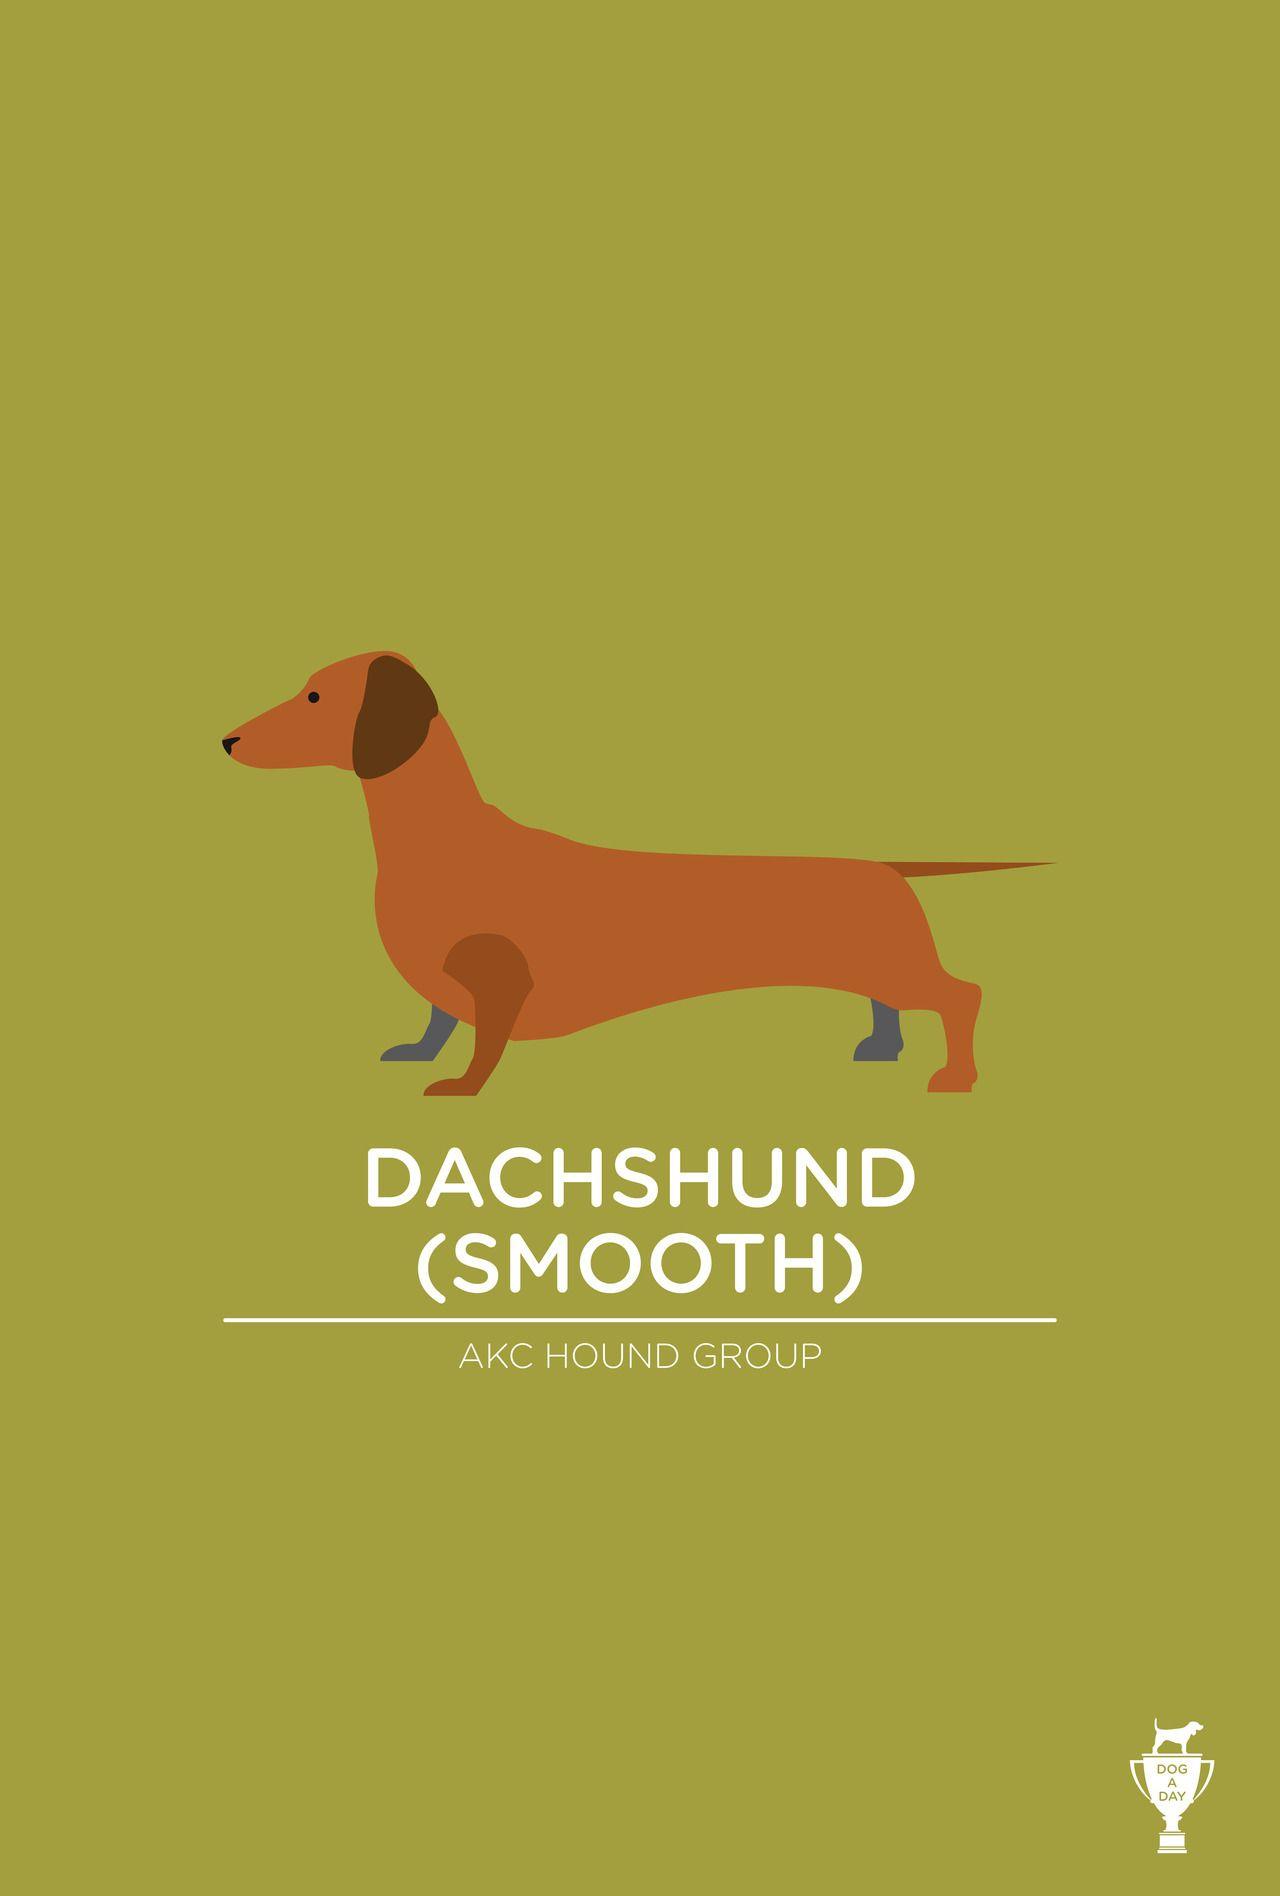 Dachshund (Smooth) Dachshund, Dachshund art, Dog art